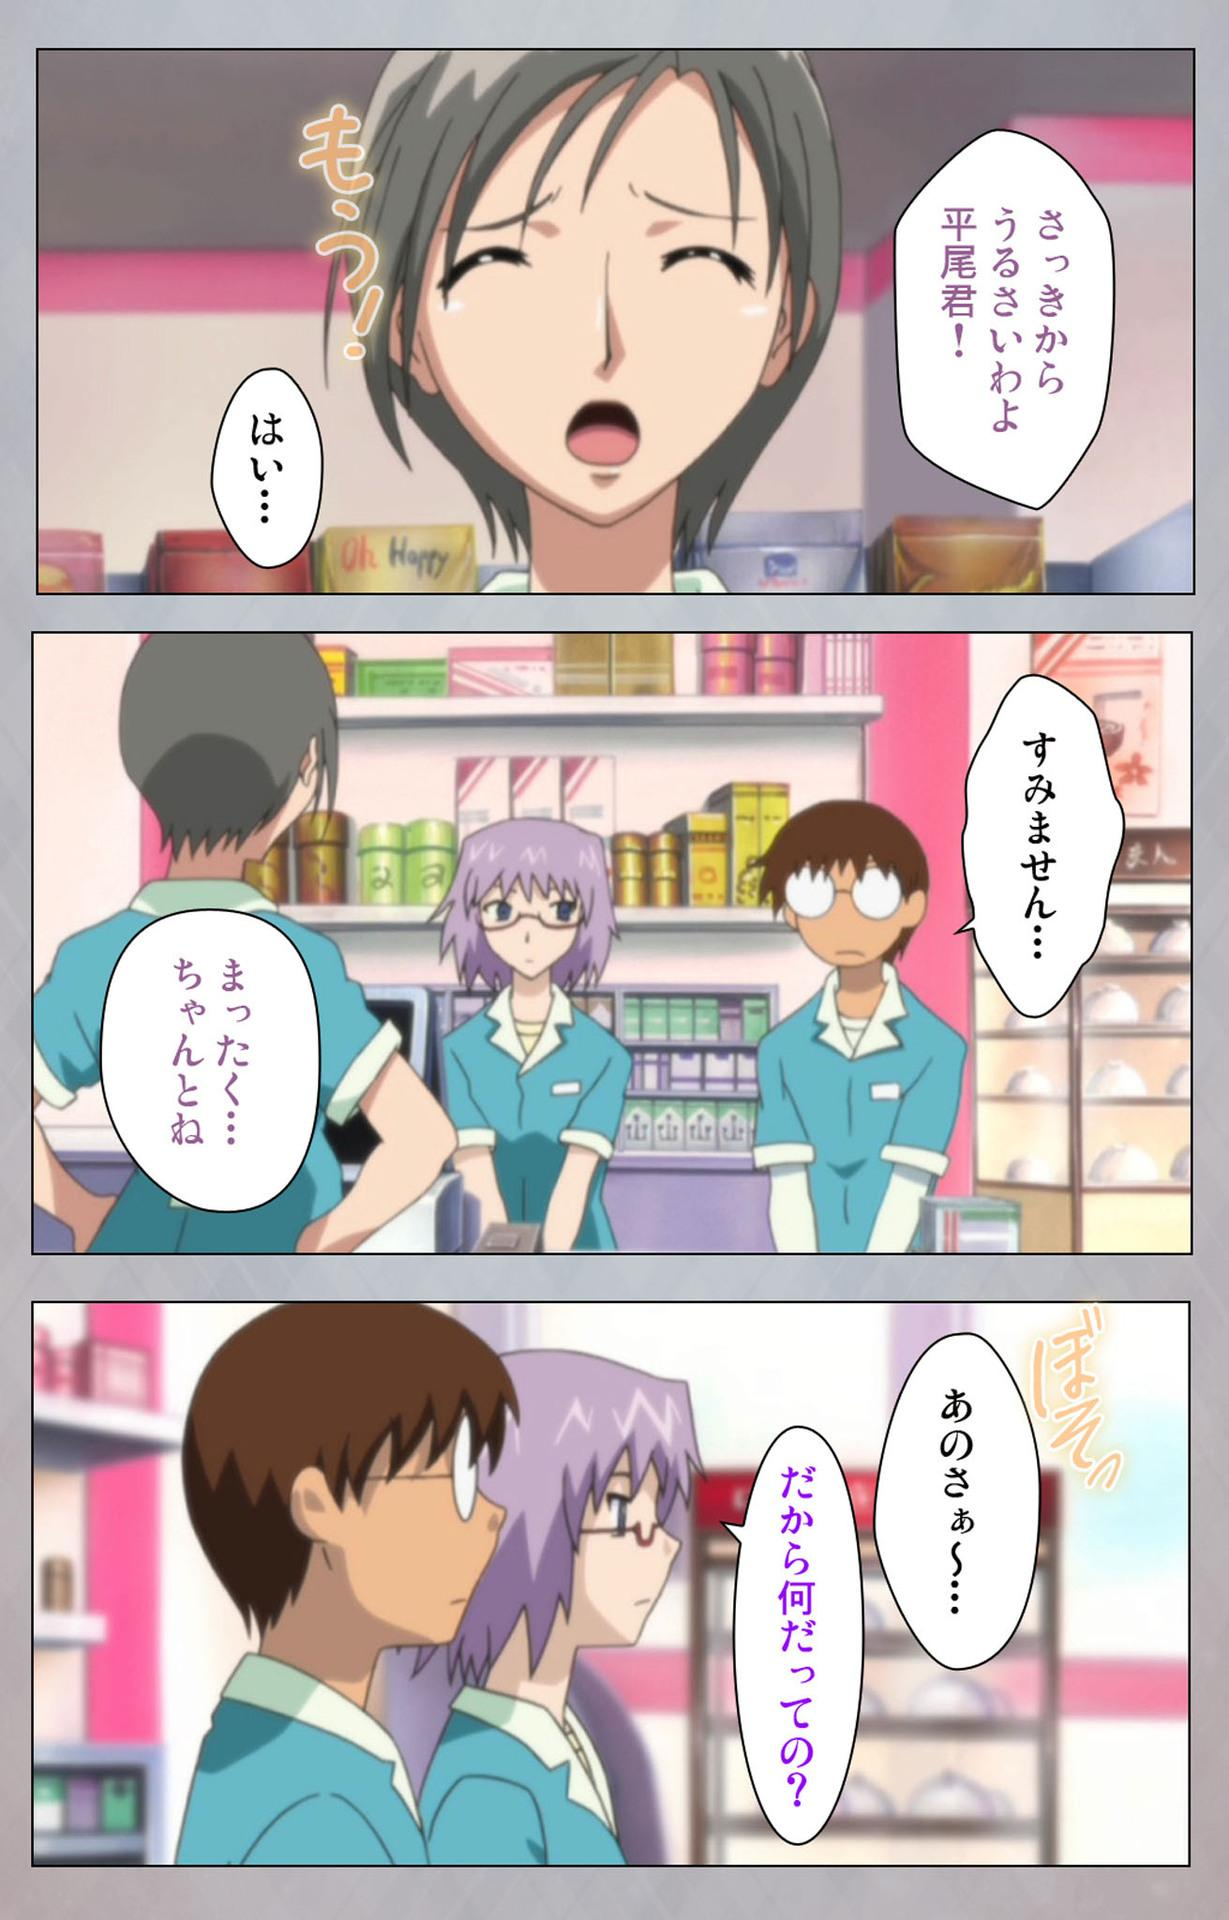 [Digital Works] [Full Color Seijin Ban] Sex Android ~Risou no Onna de Nuite yaru~ Kanzenban 116